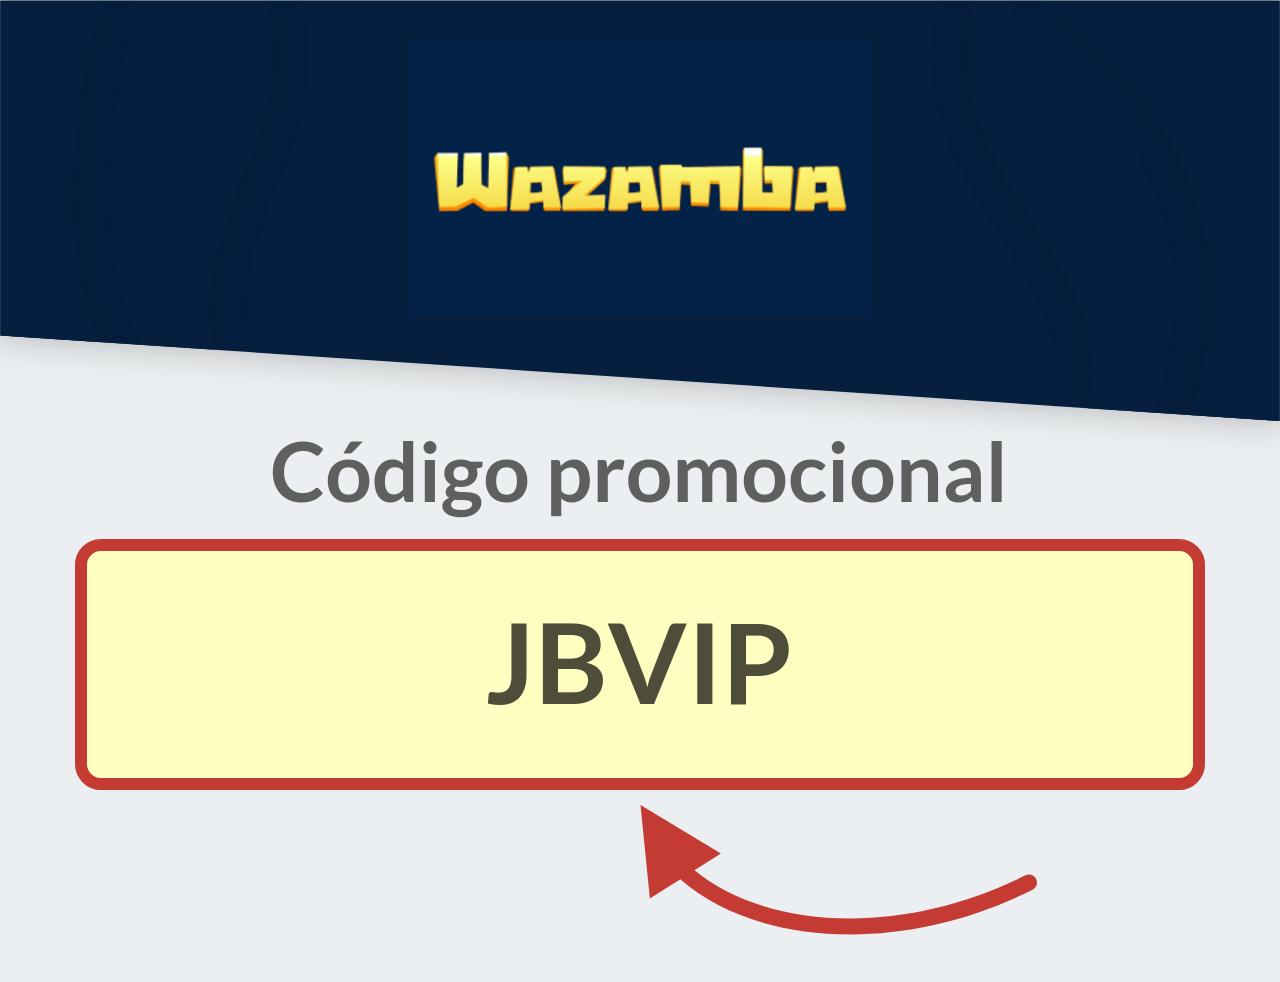 Código promocional Wazamba